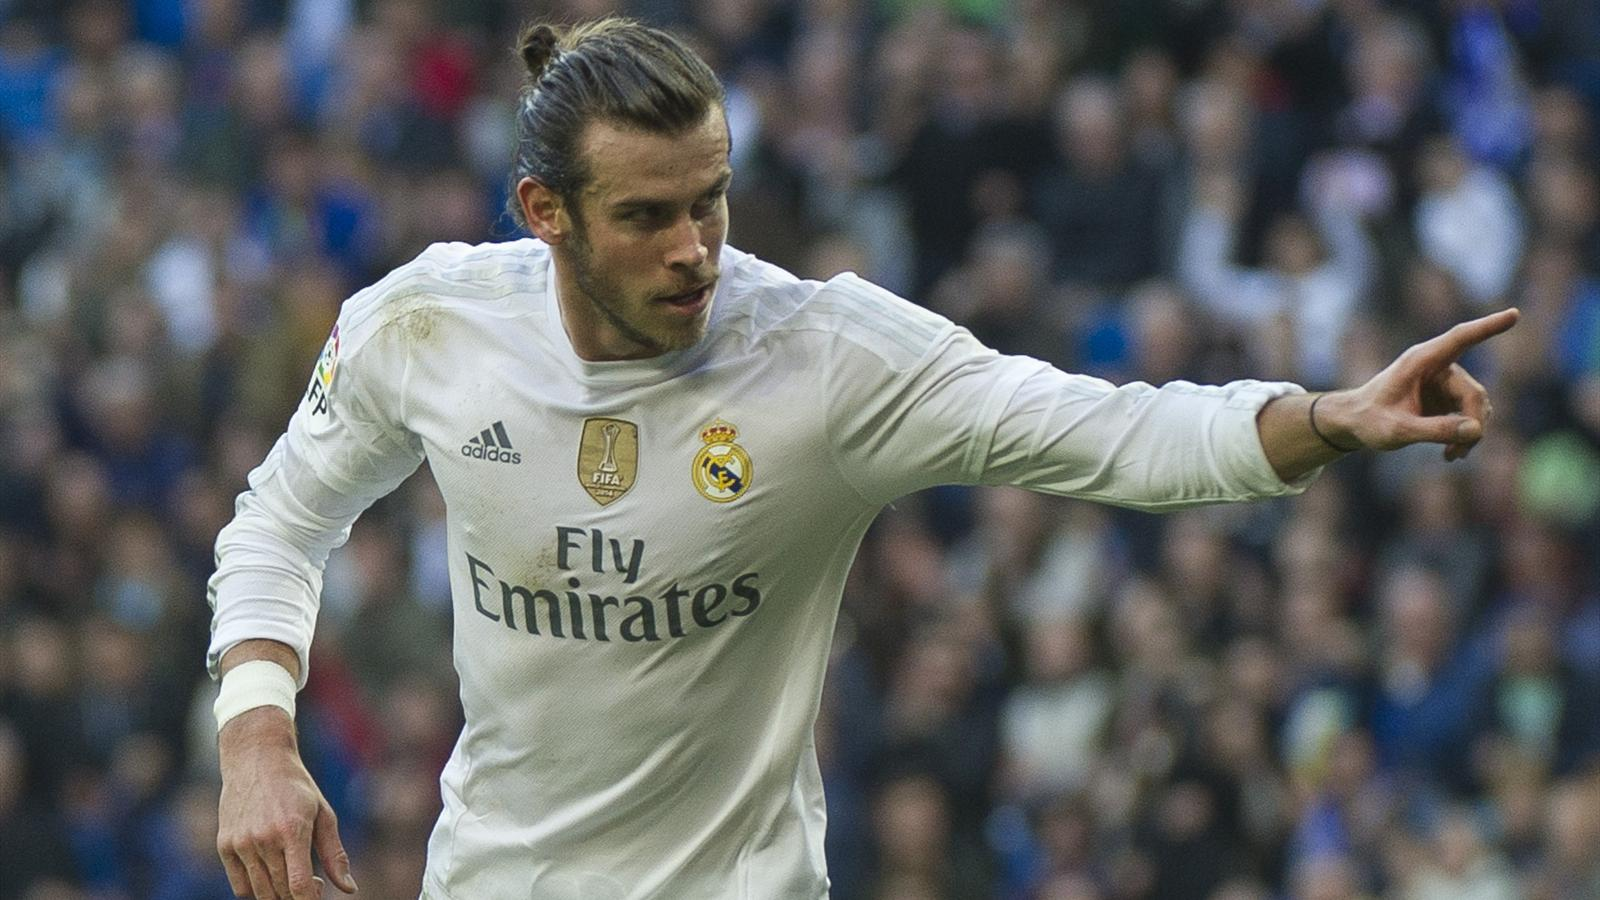 Bale, Real Madrid